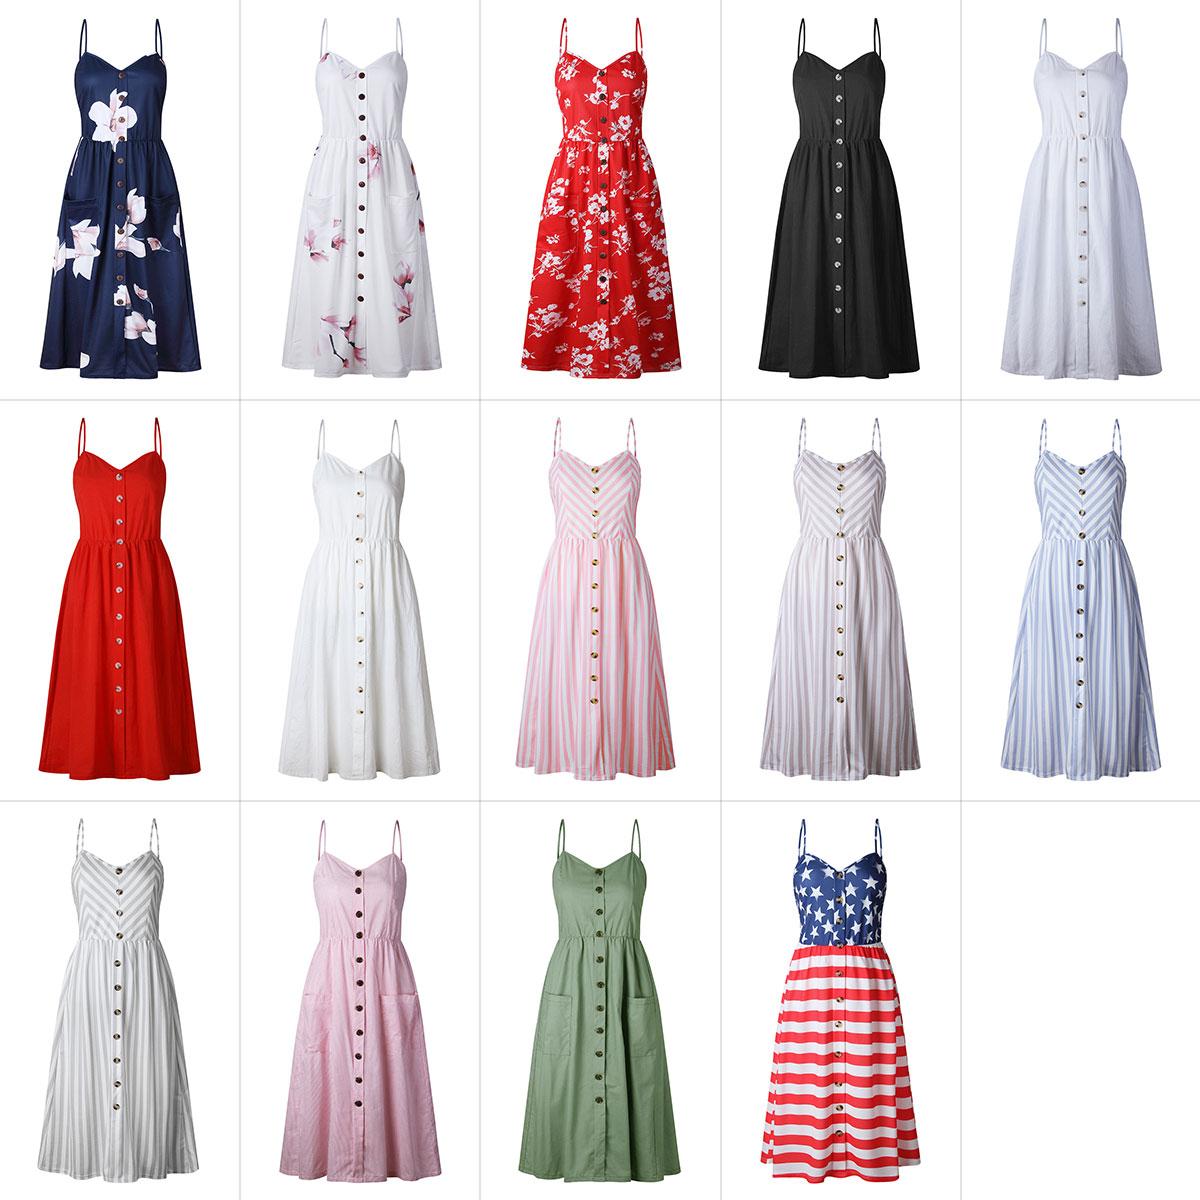 2019 Summer Women Button Decorated Print Dress Off-shoulder Party Beach Sundress Boho Spaghetti Long Dresses Plus Size FICUSRONG 5